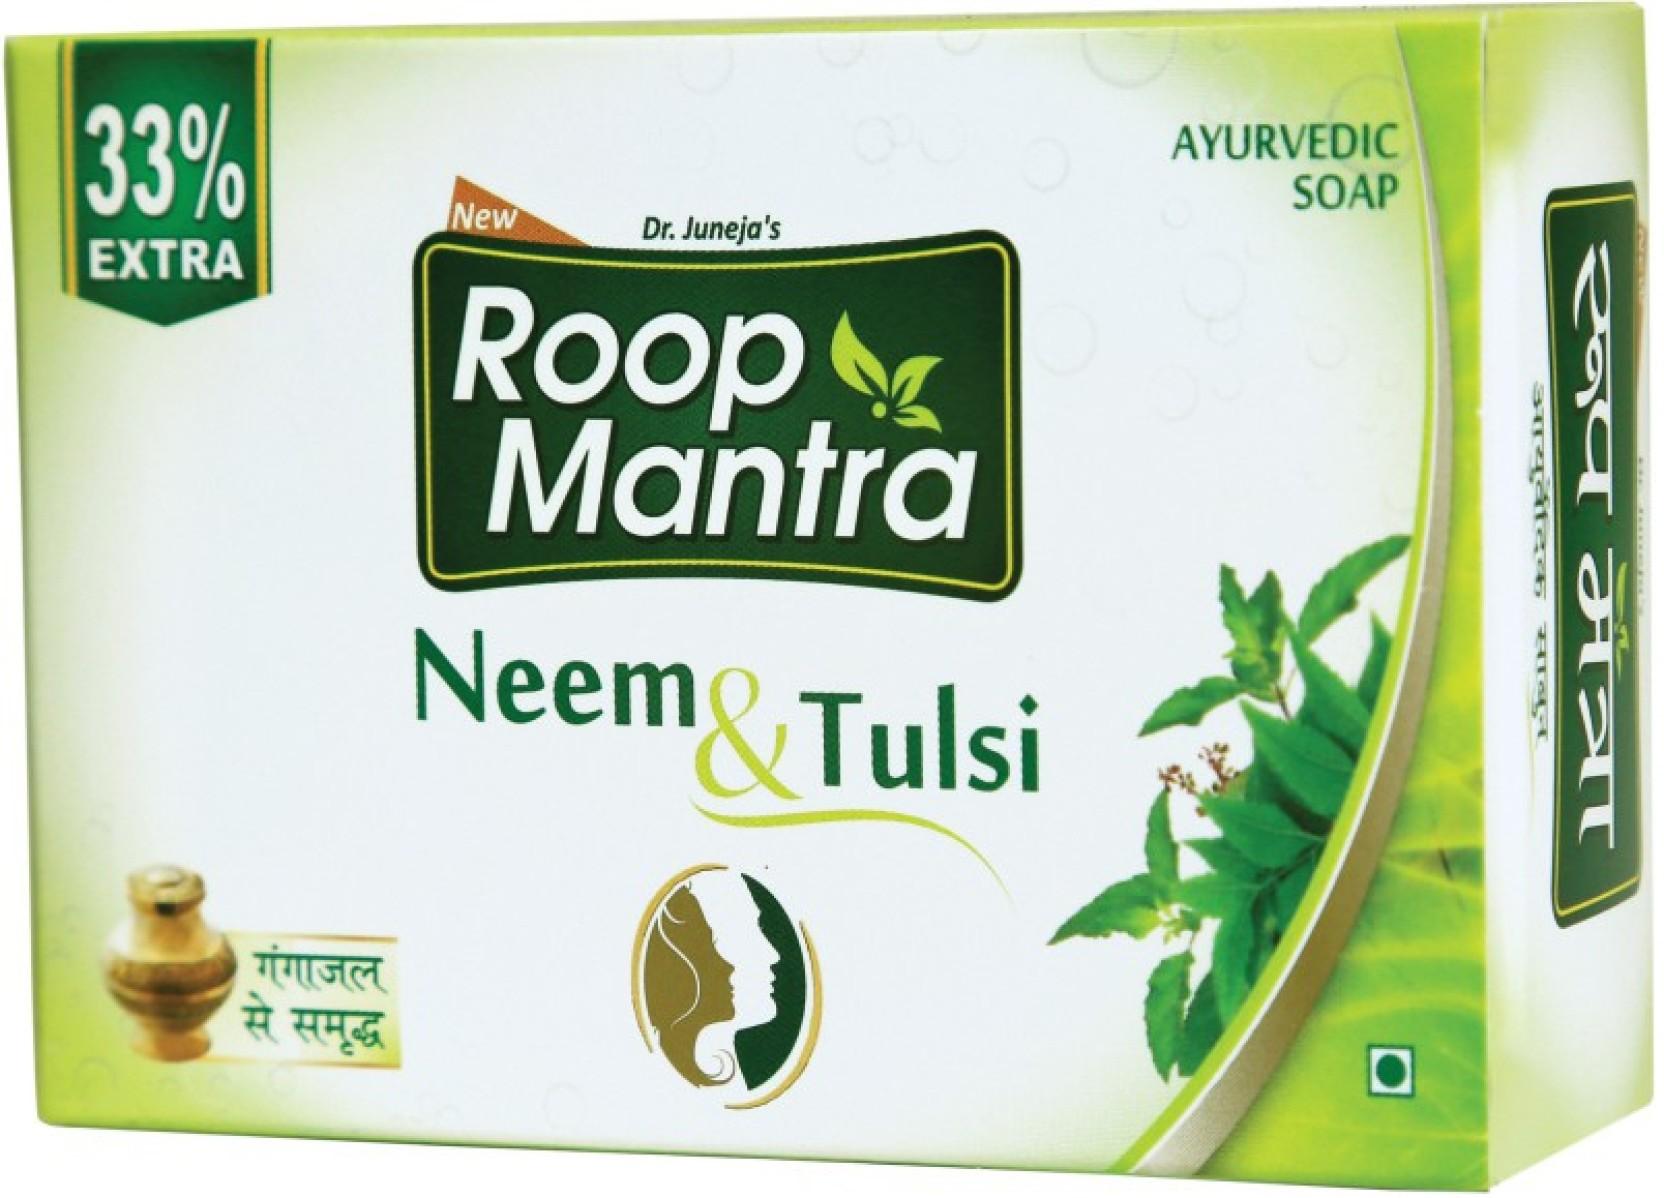 Roop Mantra Neem And Tulsi Ayurvedic Soap